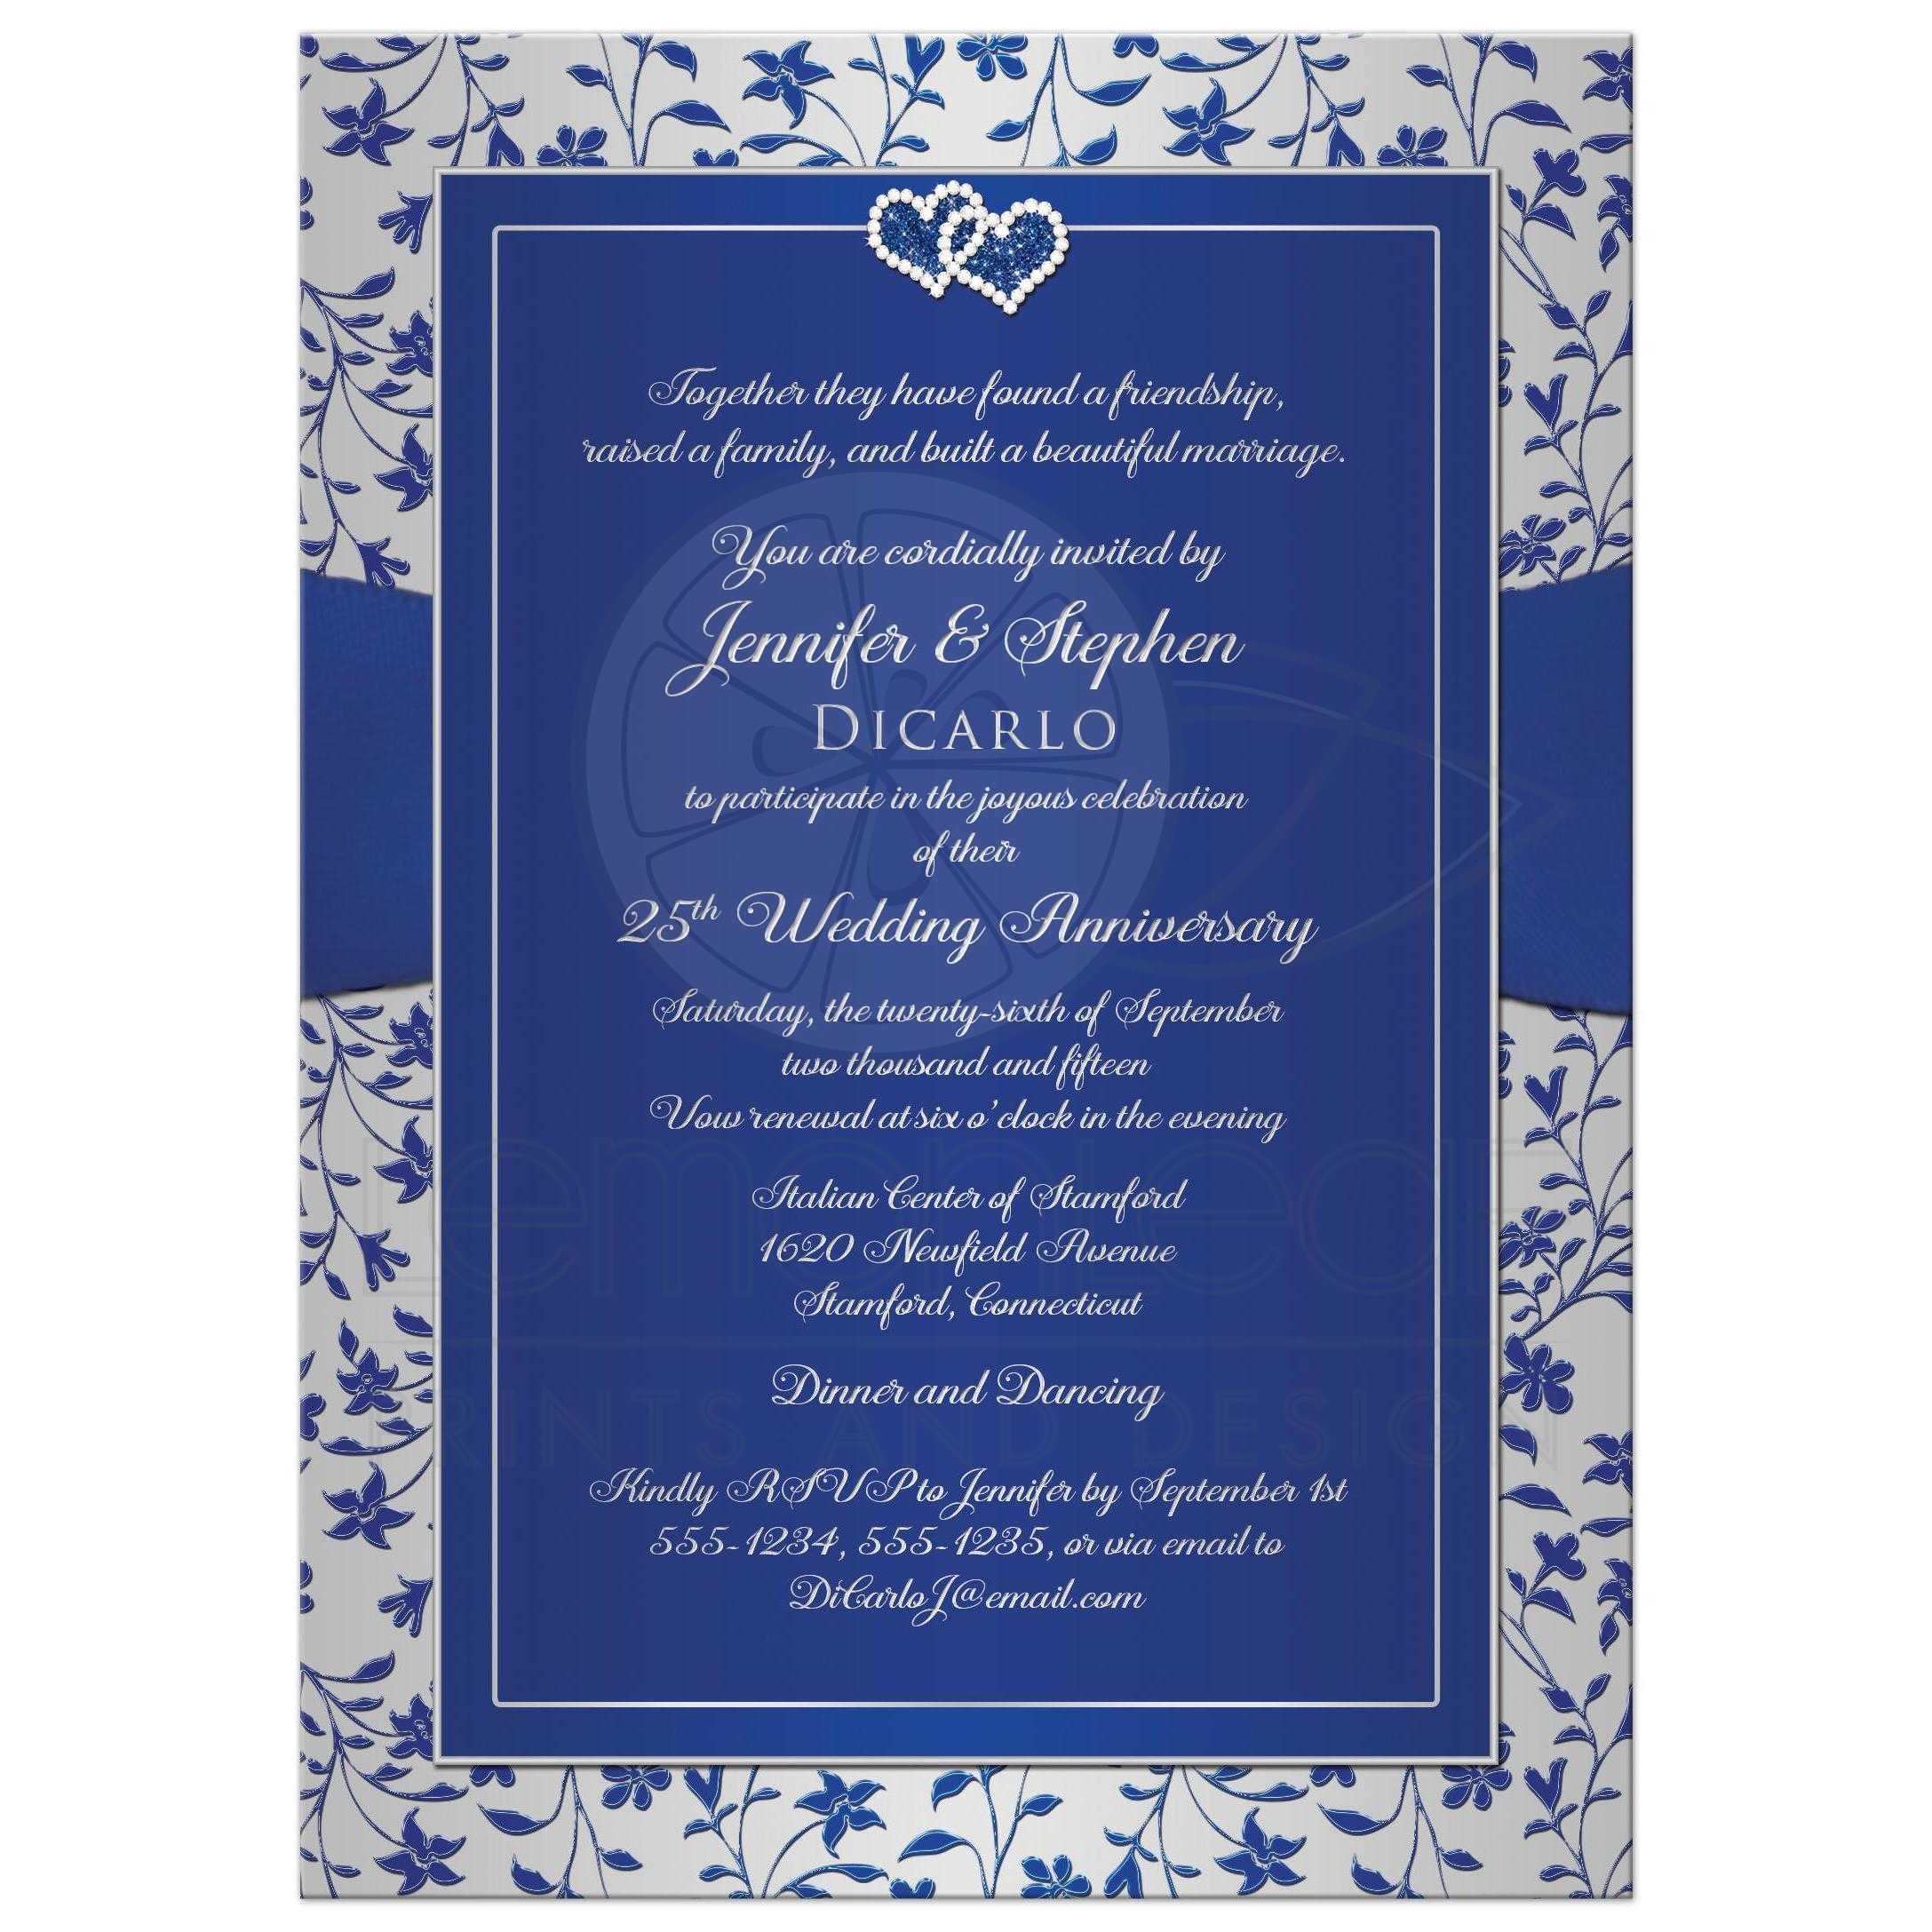 Wedding Invitations Blue And Silver: 25th Wedding Anniversary Invitation